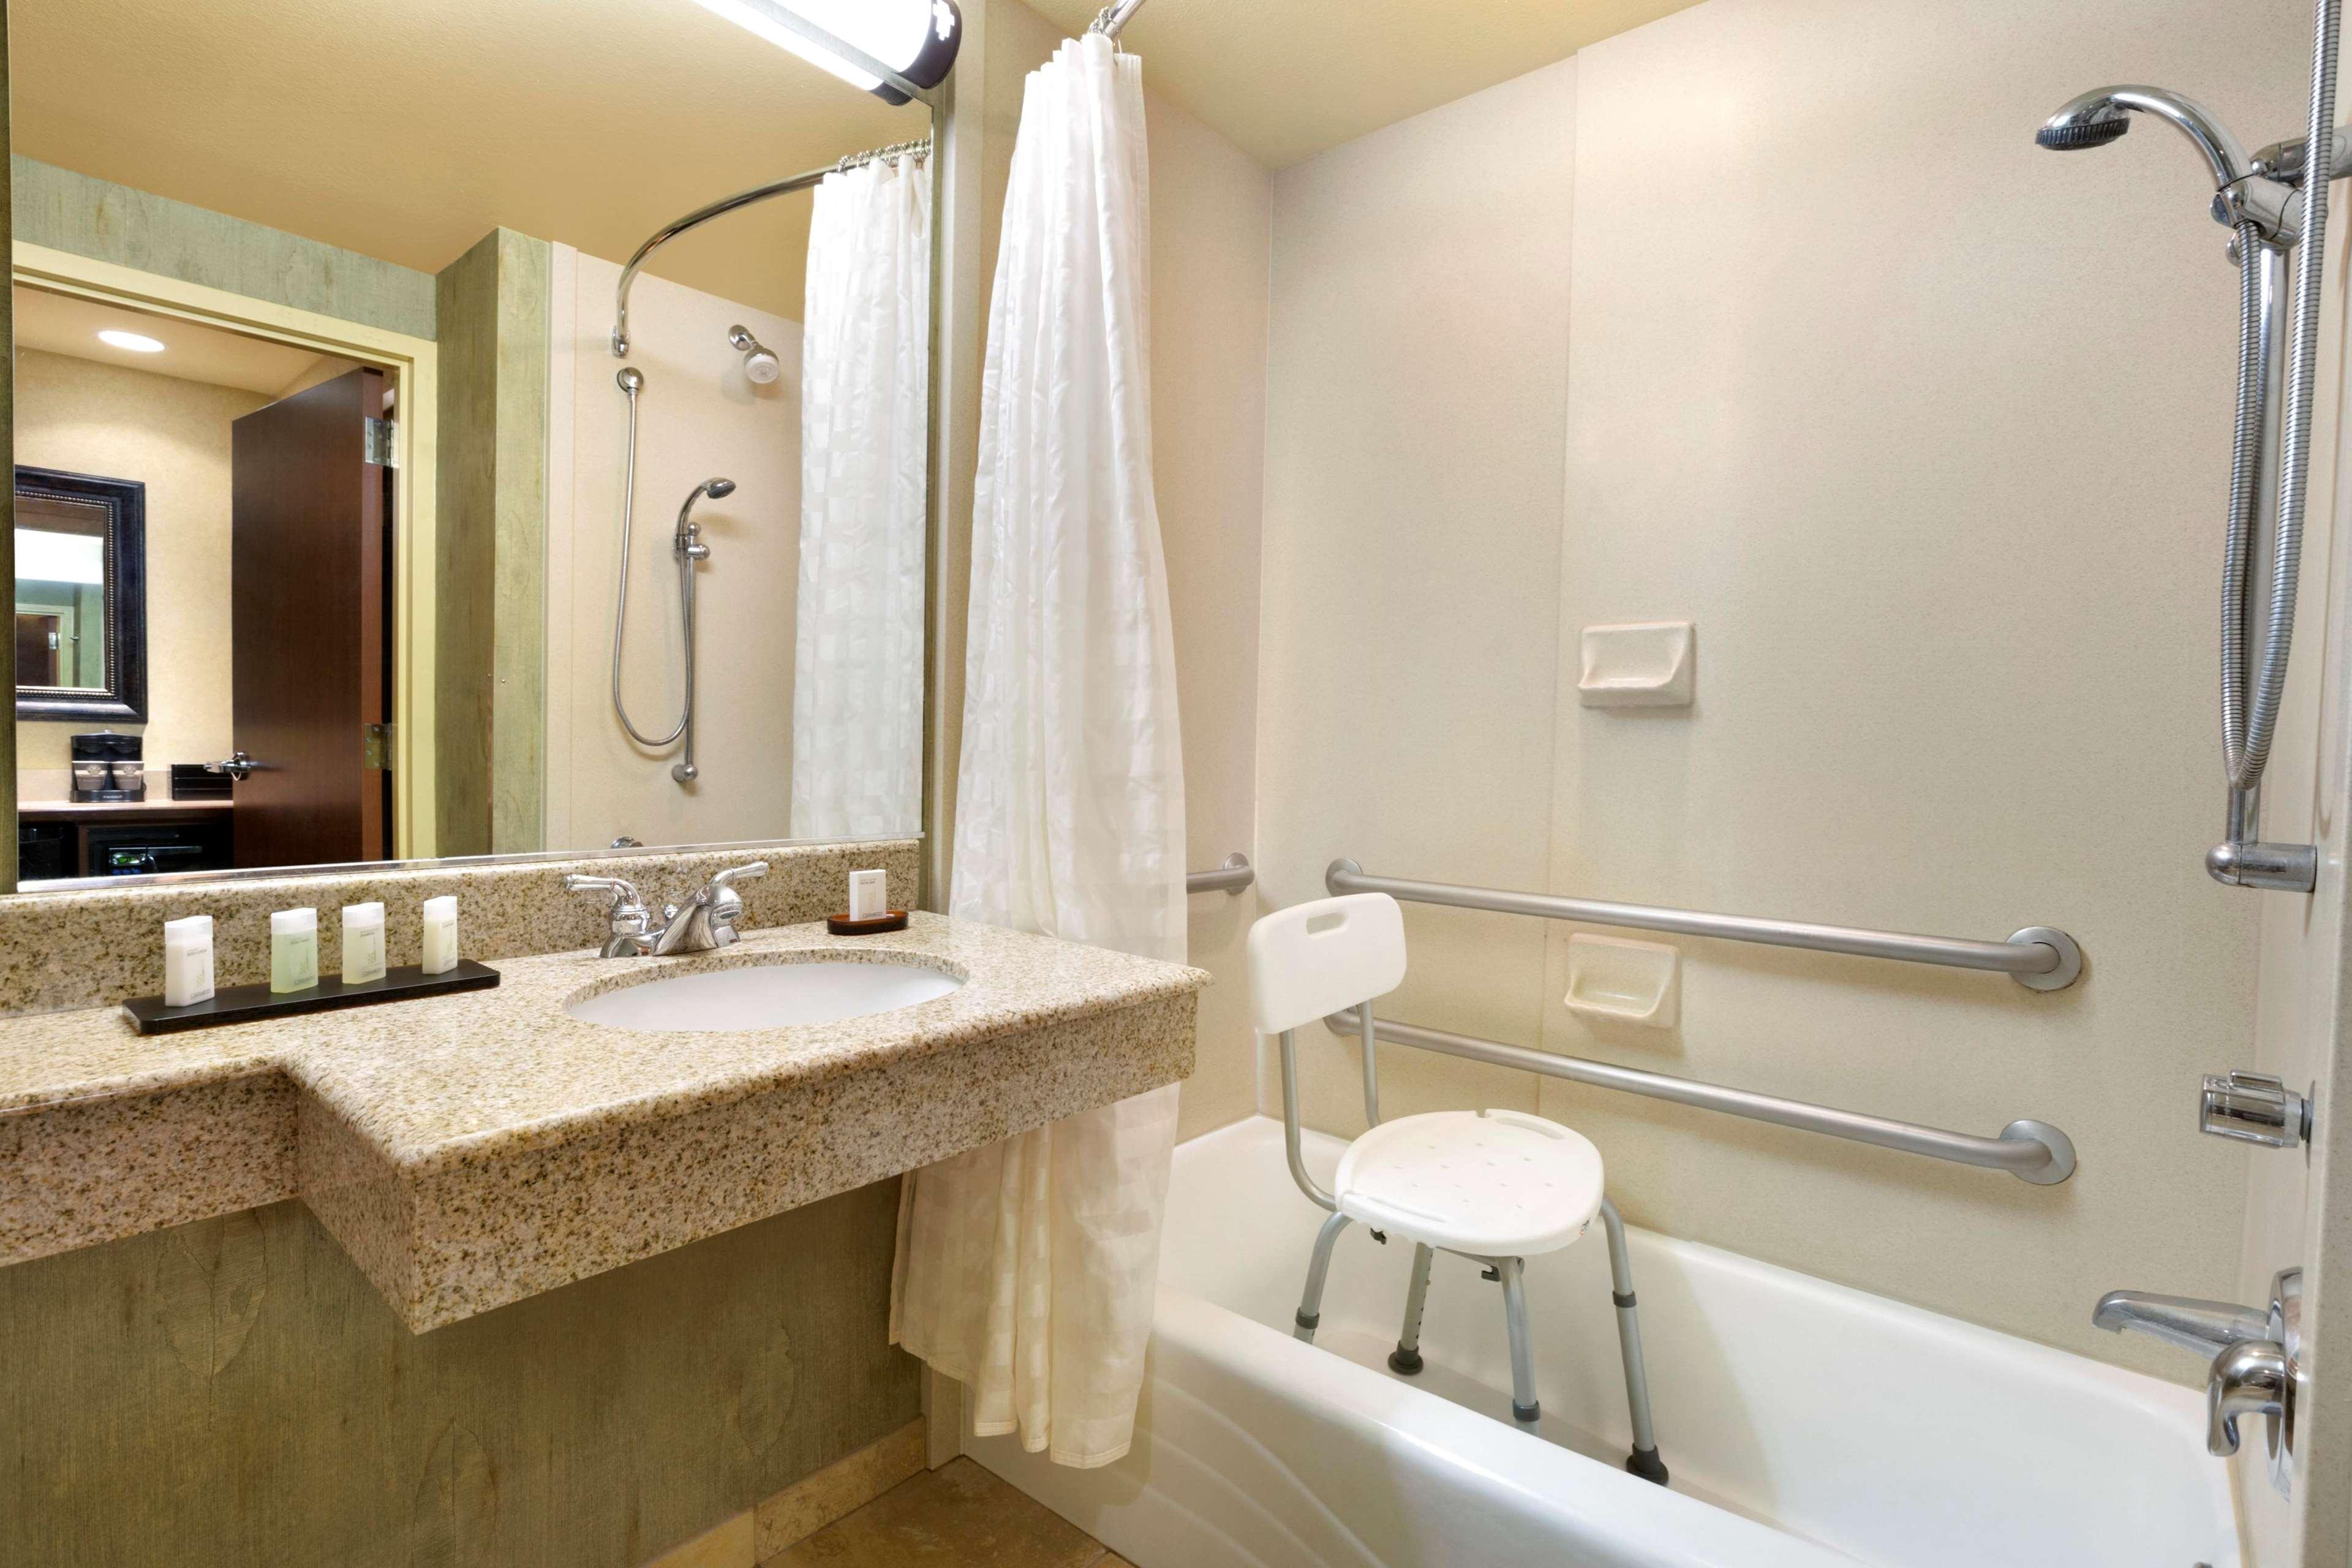 Embassy Suites by Hilton Albuquerque Hotel & Spa image 48